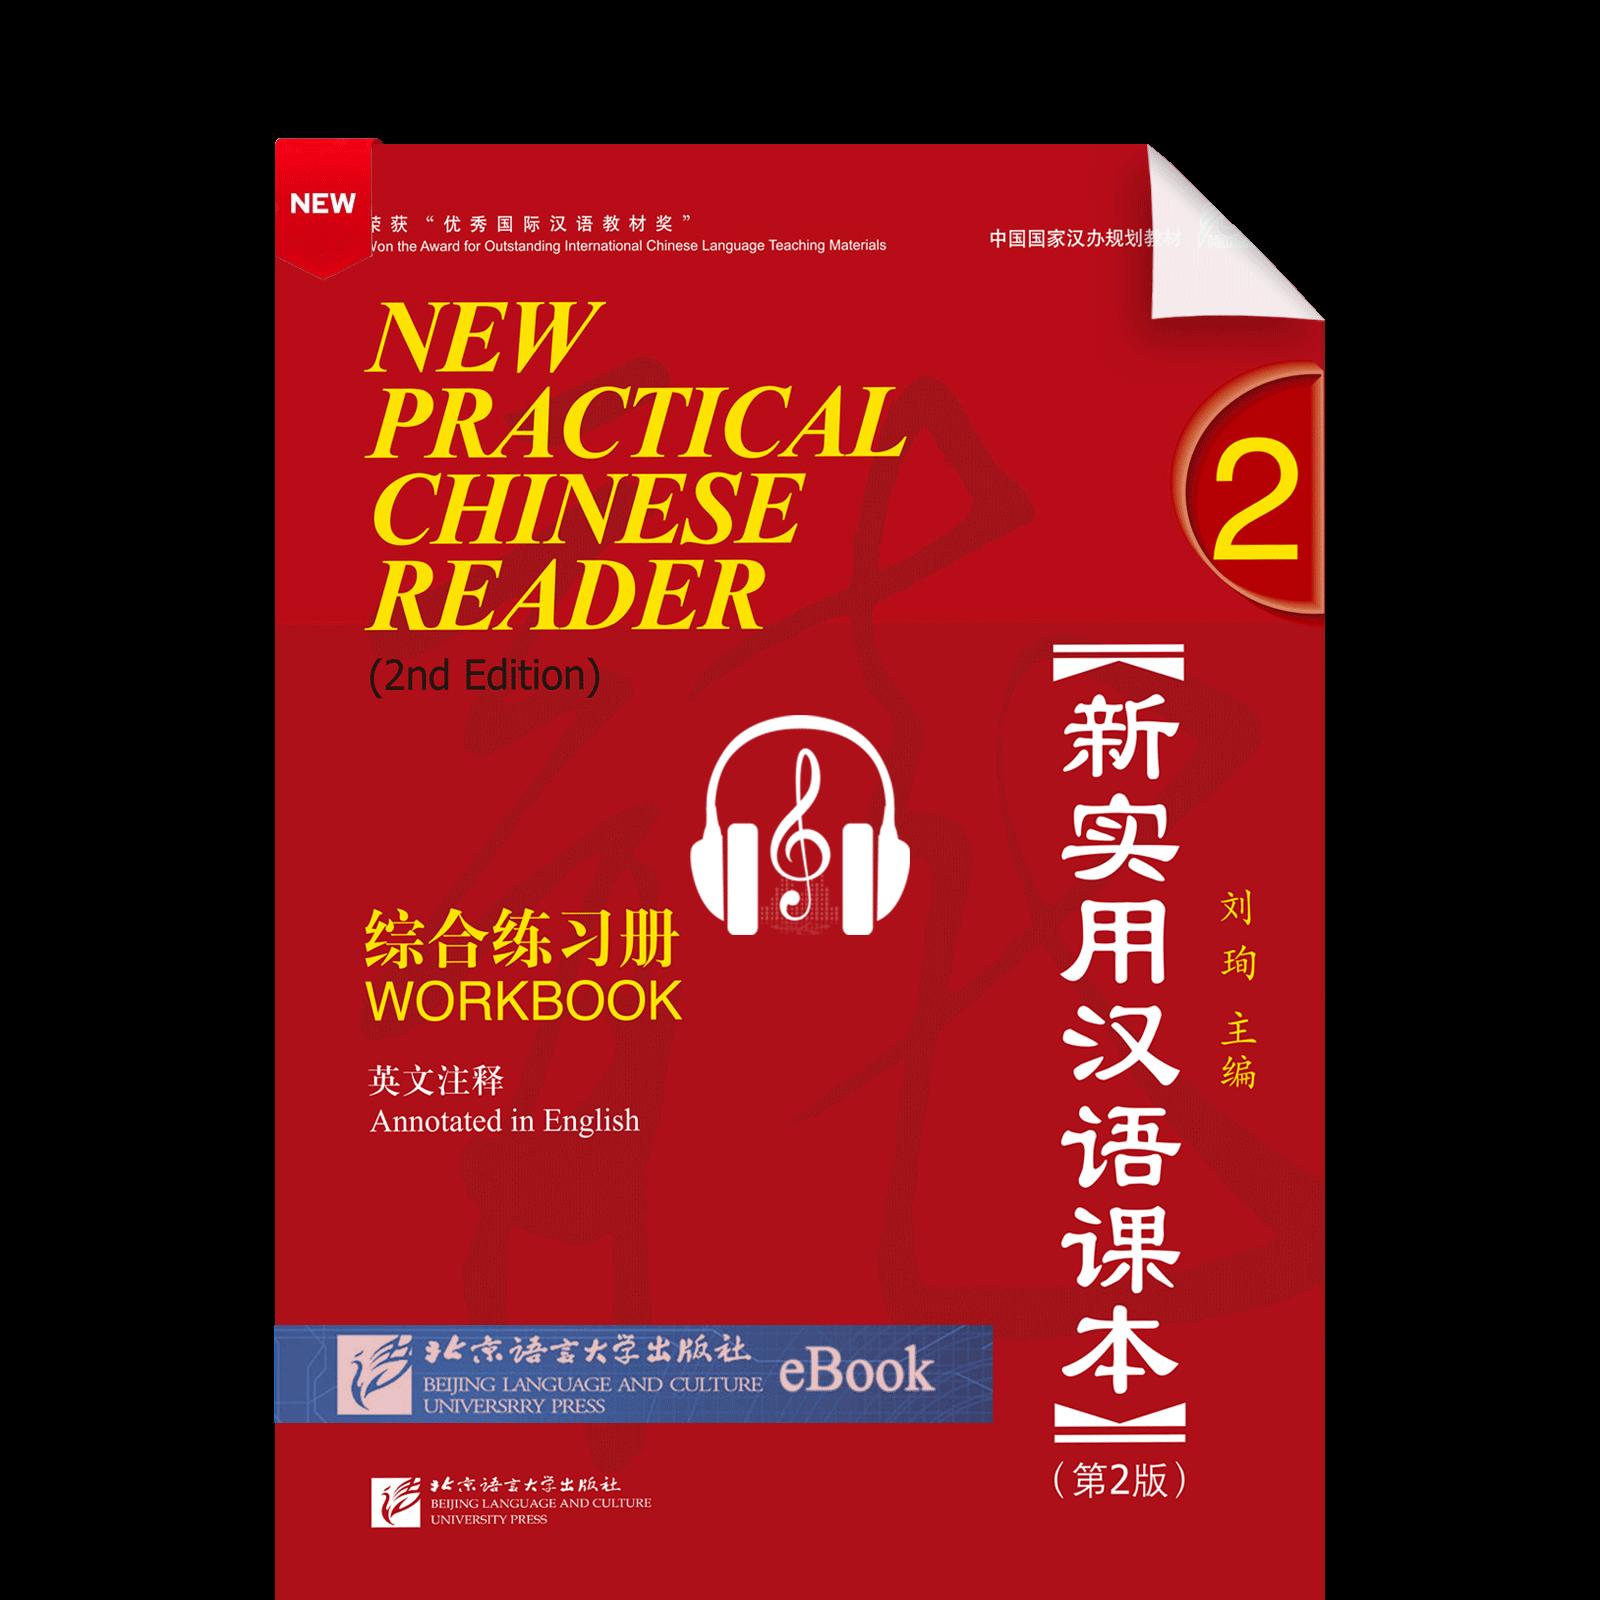 New Practical Chinese Reader Di2Ban Xin Shiyong Hanyu Keben Di2Ce Workbook with Audio